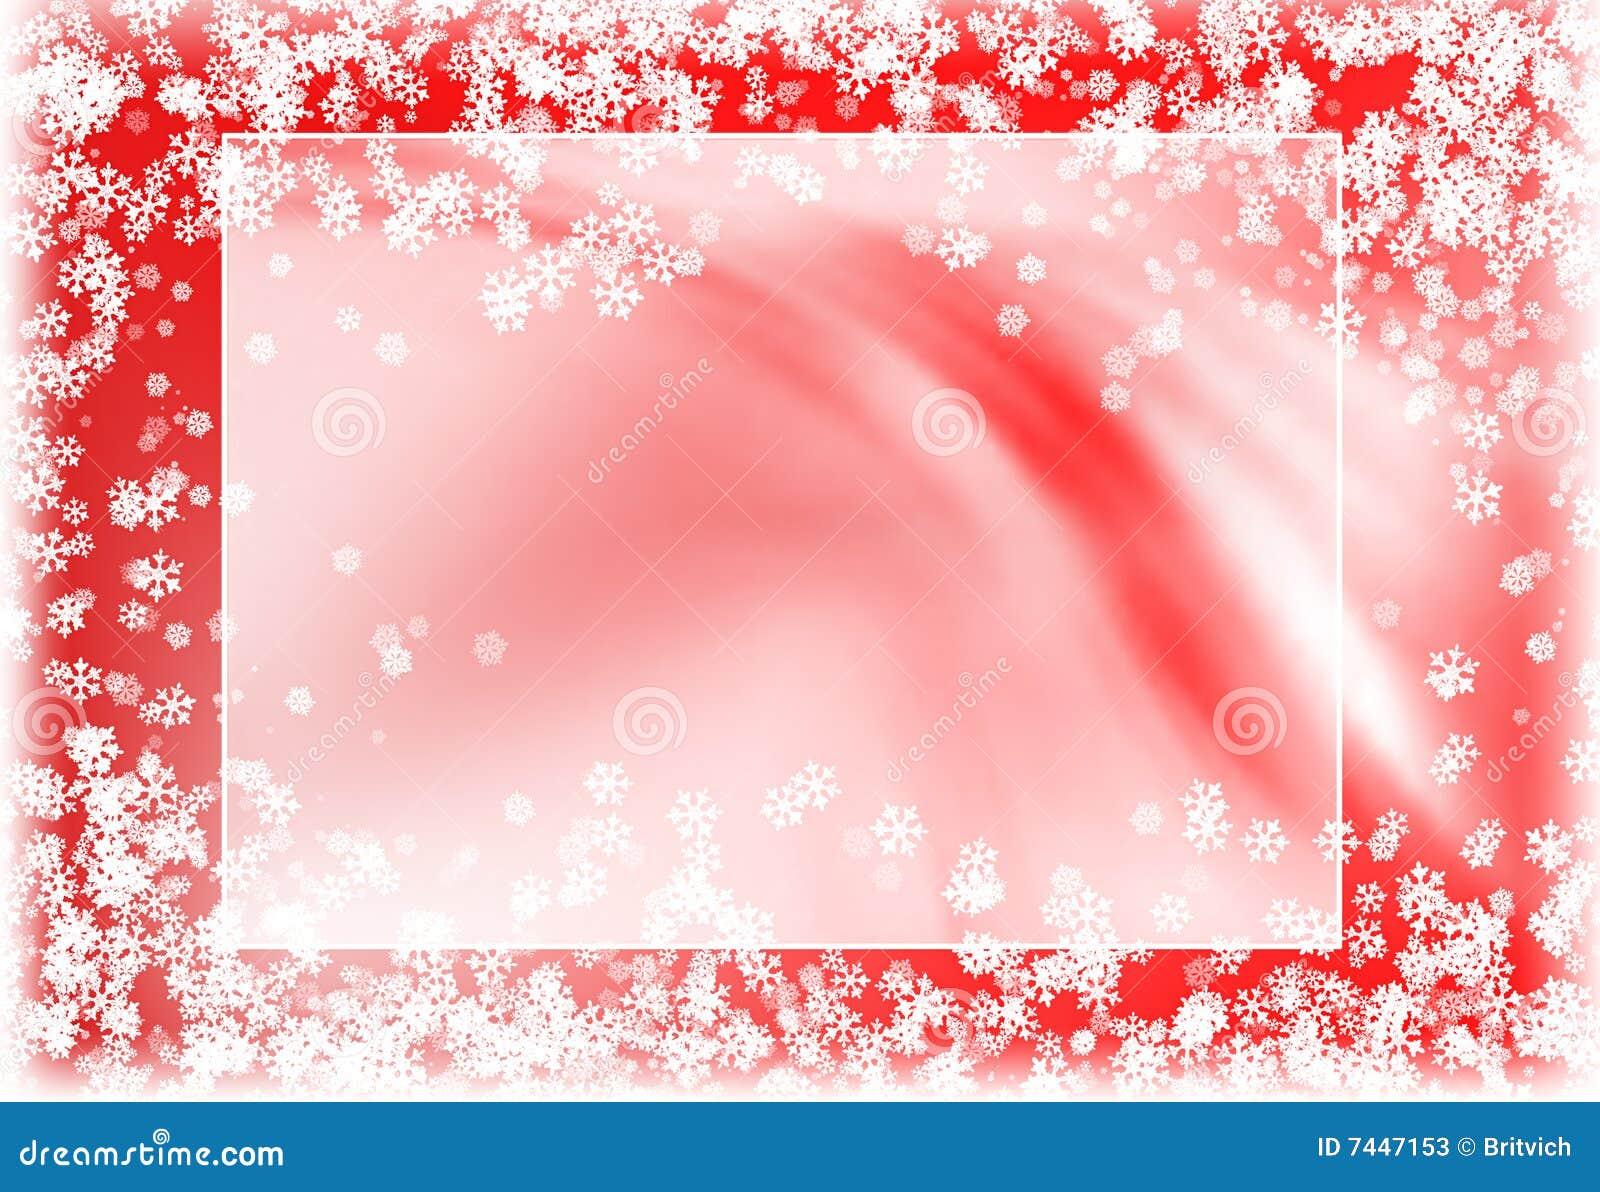 Snowy red frame